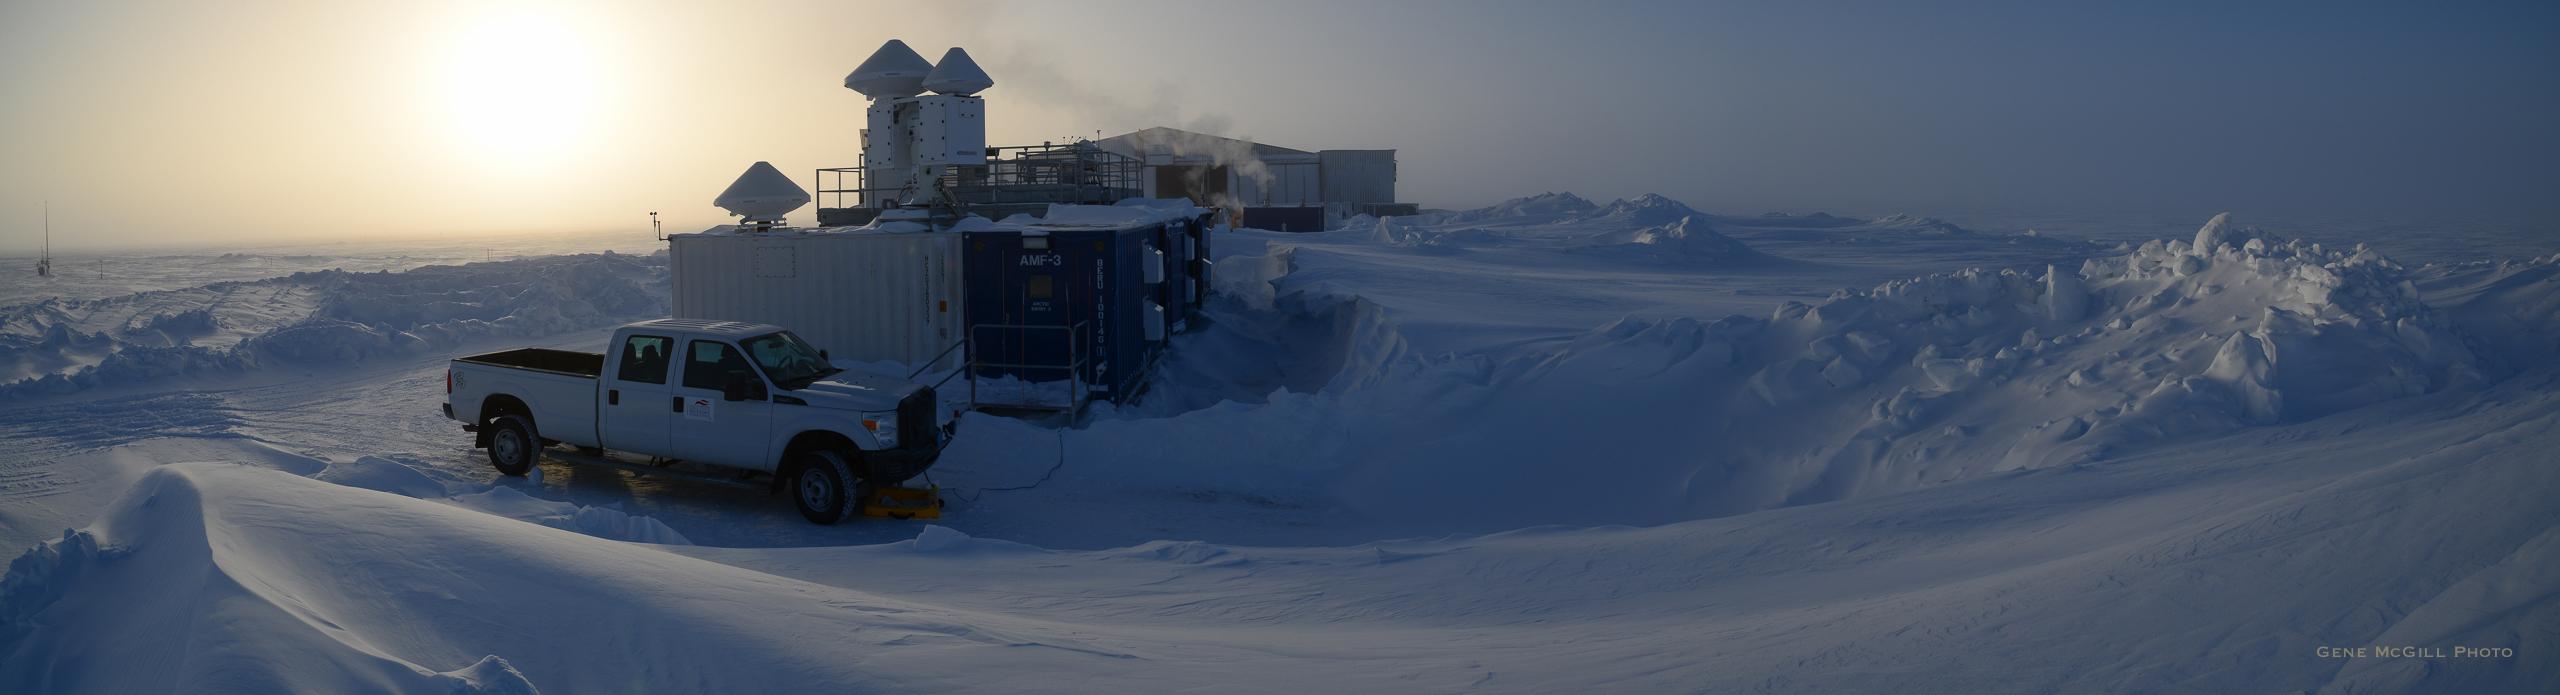 AMF-3 at Oliktok Point, North Slope of Alaska